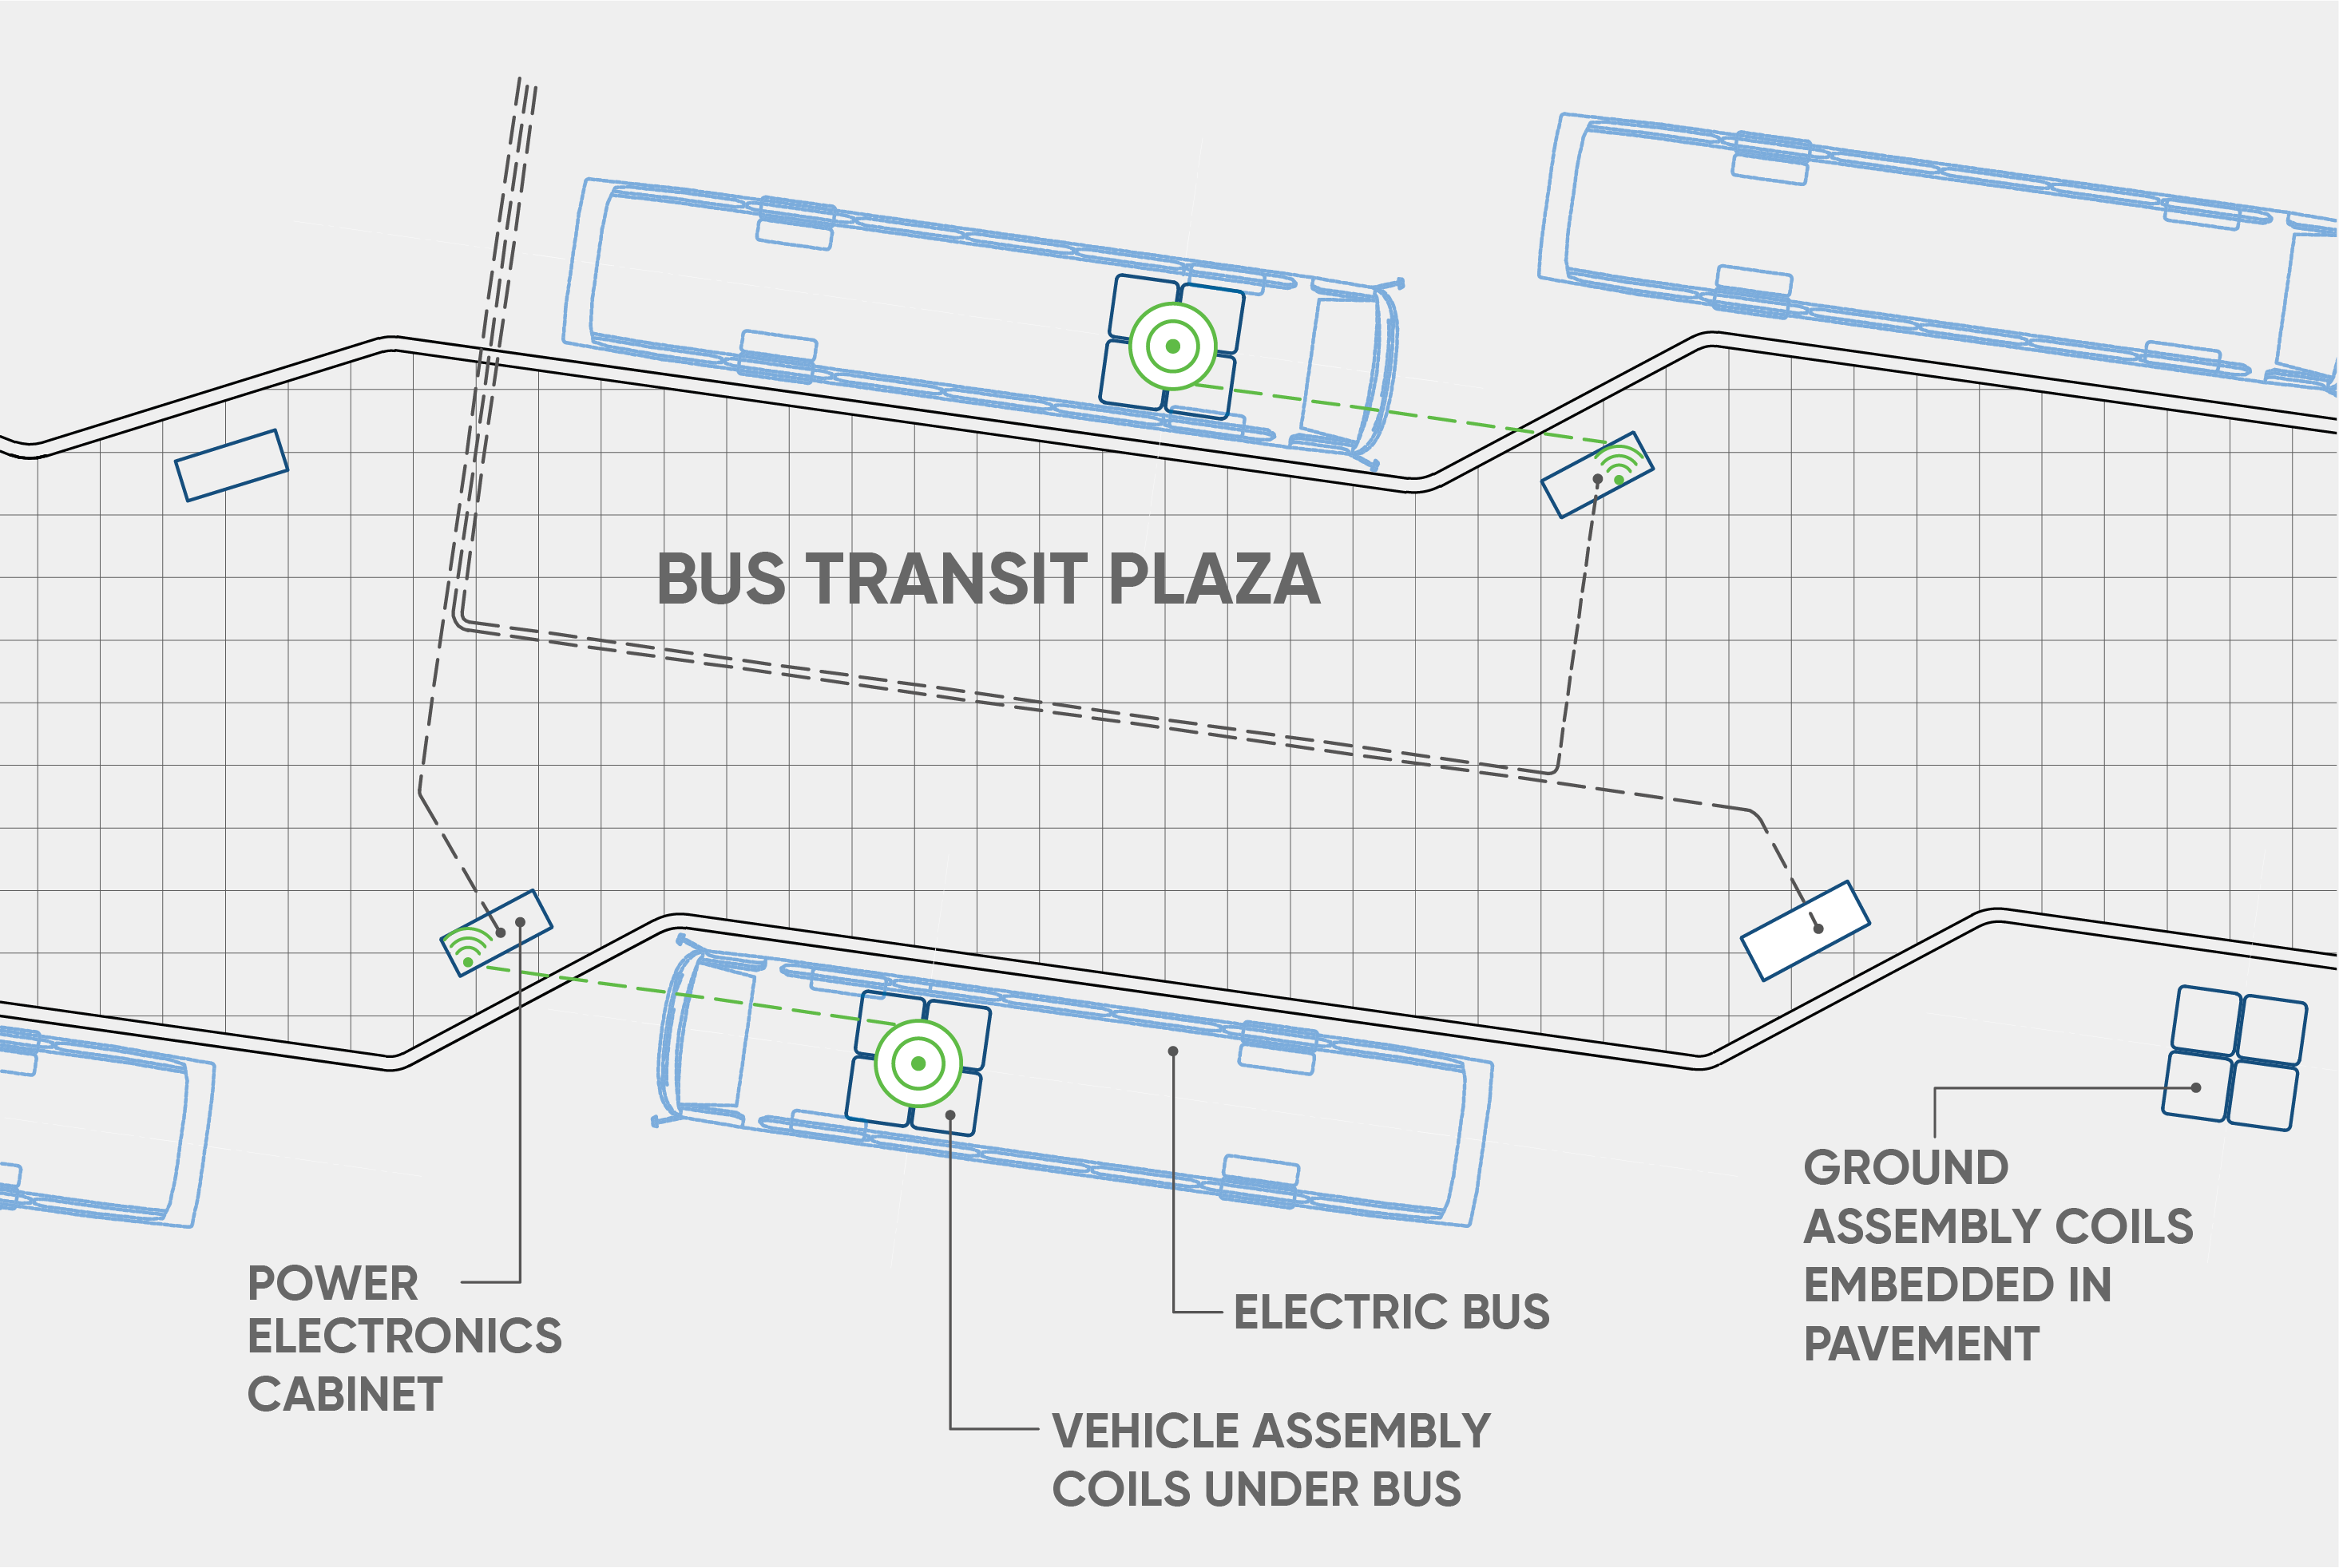 Bus transit plaza opportunity